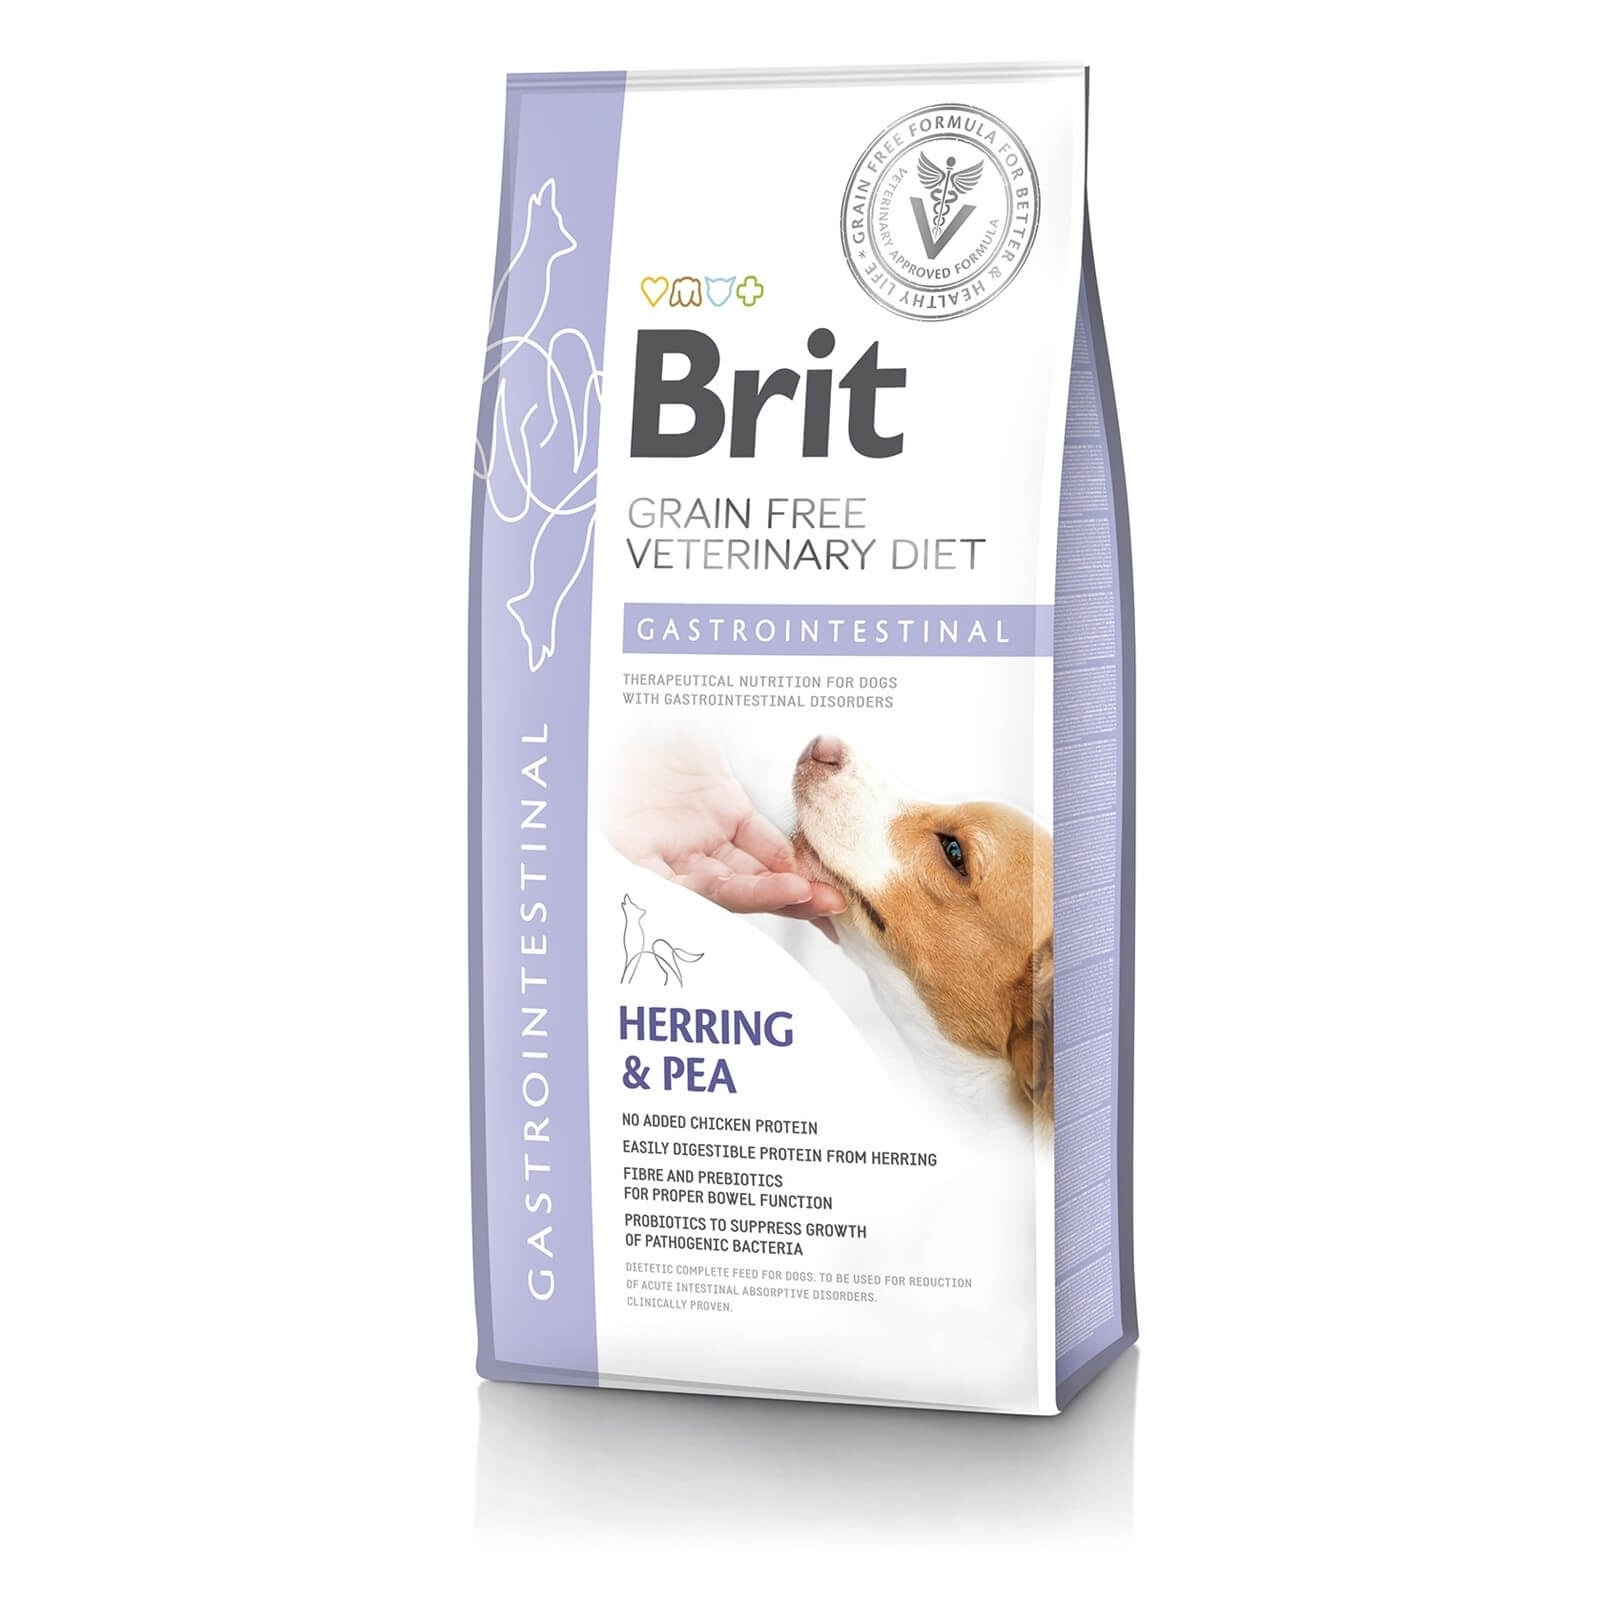 Brit Grain Free Veterinary Diets Dog Gastrointestinal, 2 kg imagine